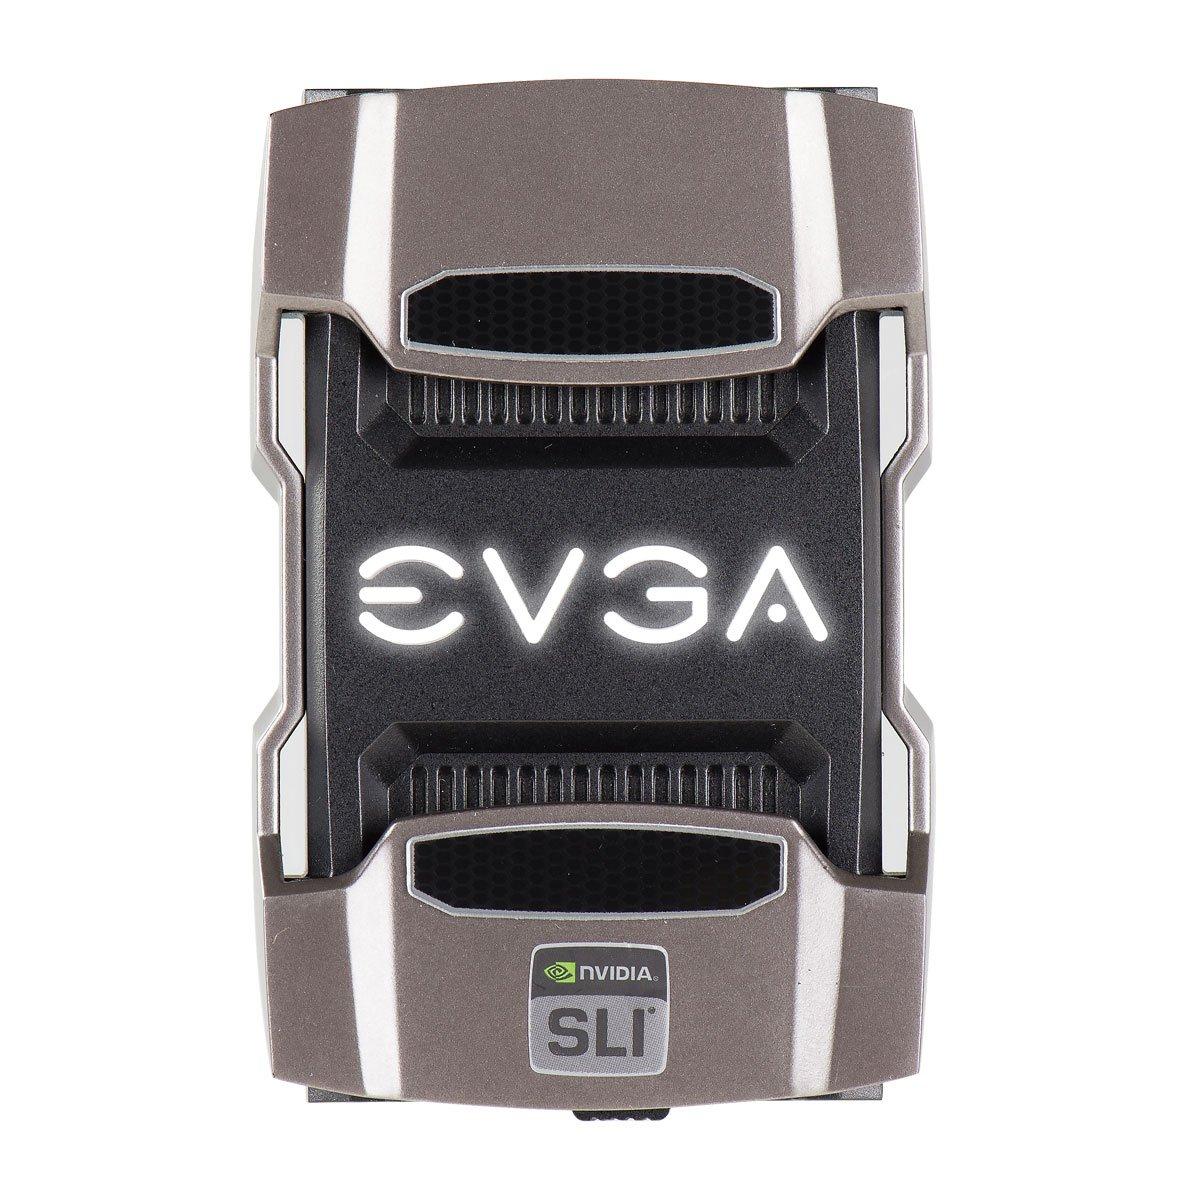 EVGA PRO SLI Bridge HB, 0 Slot Spacing (100-2W-0025-LR)